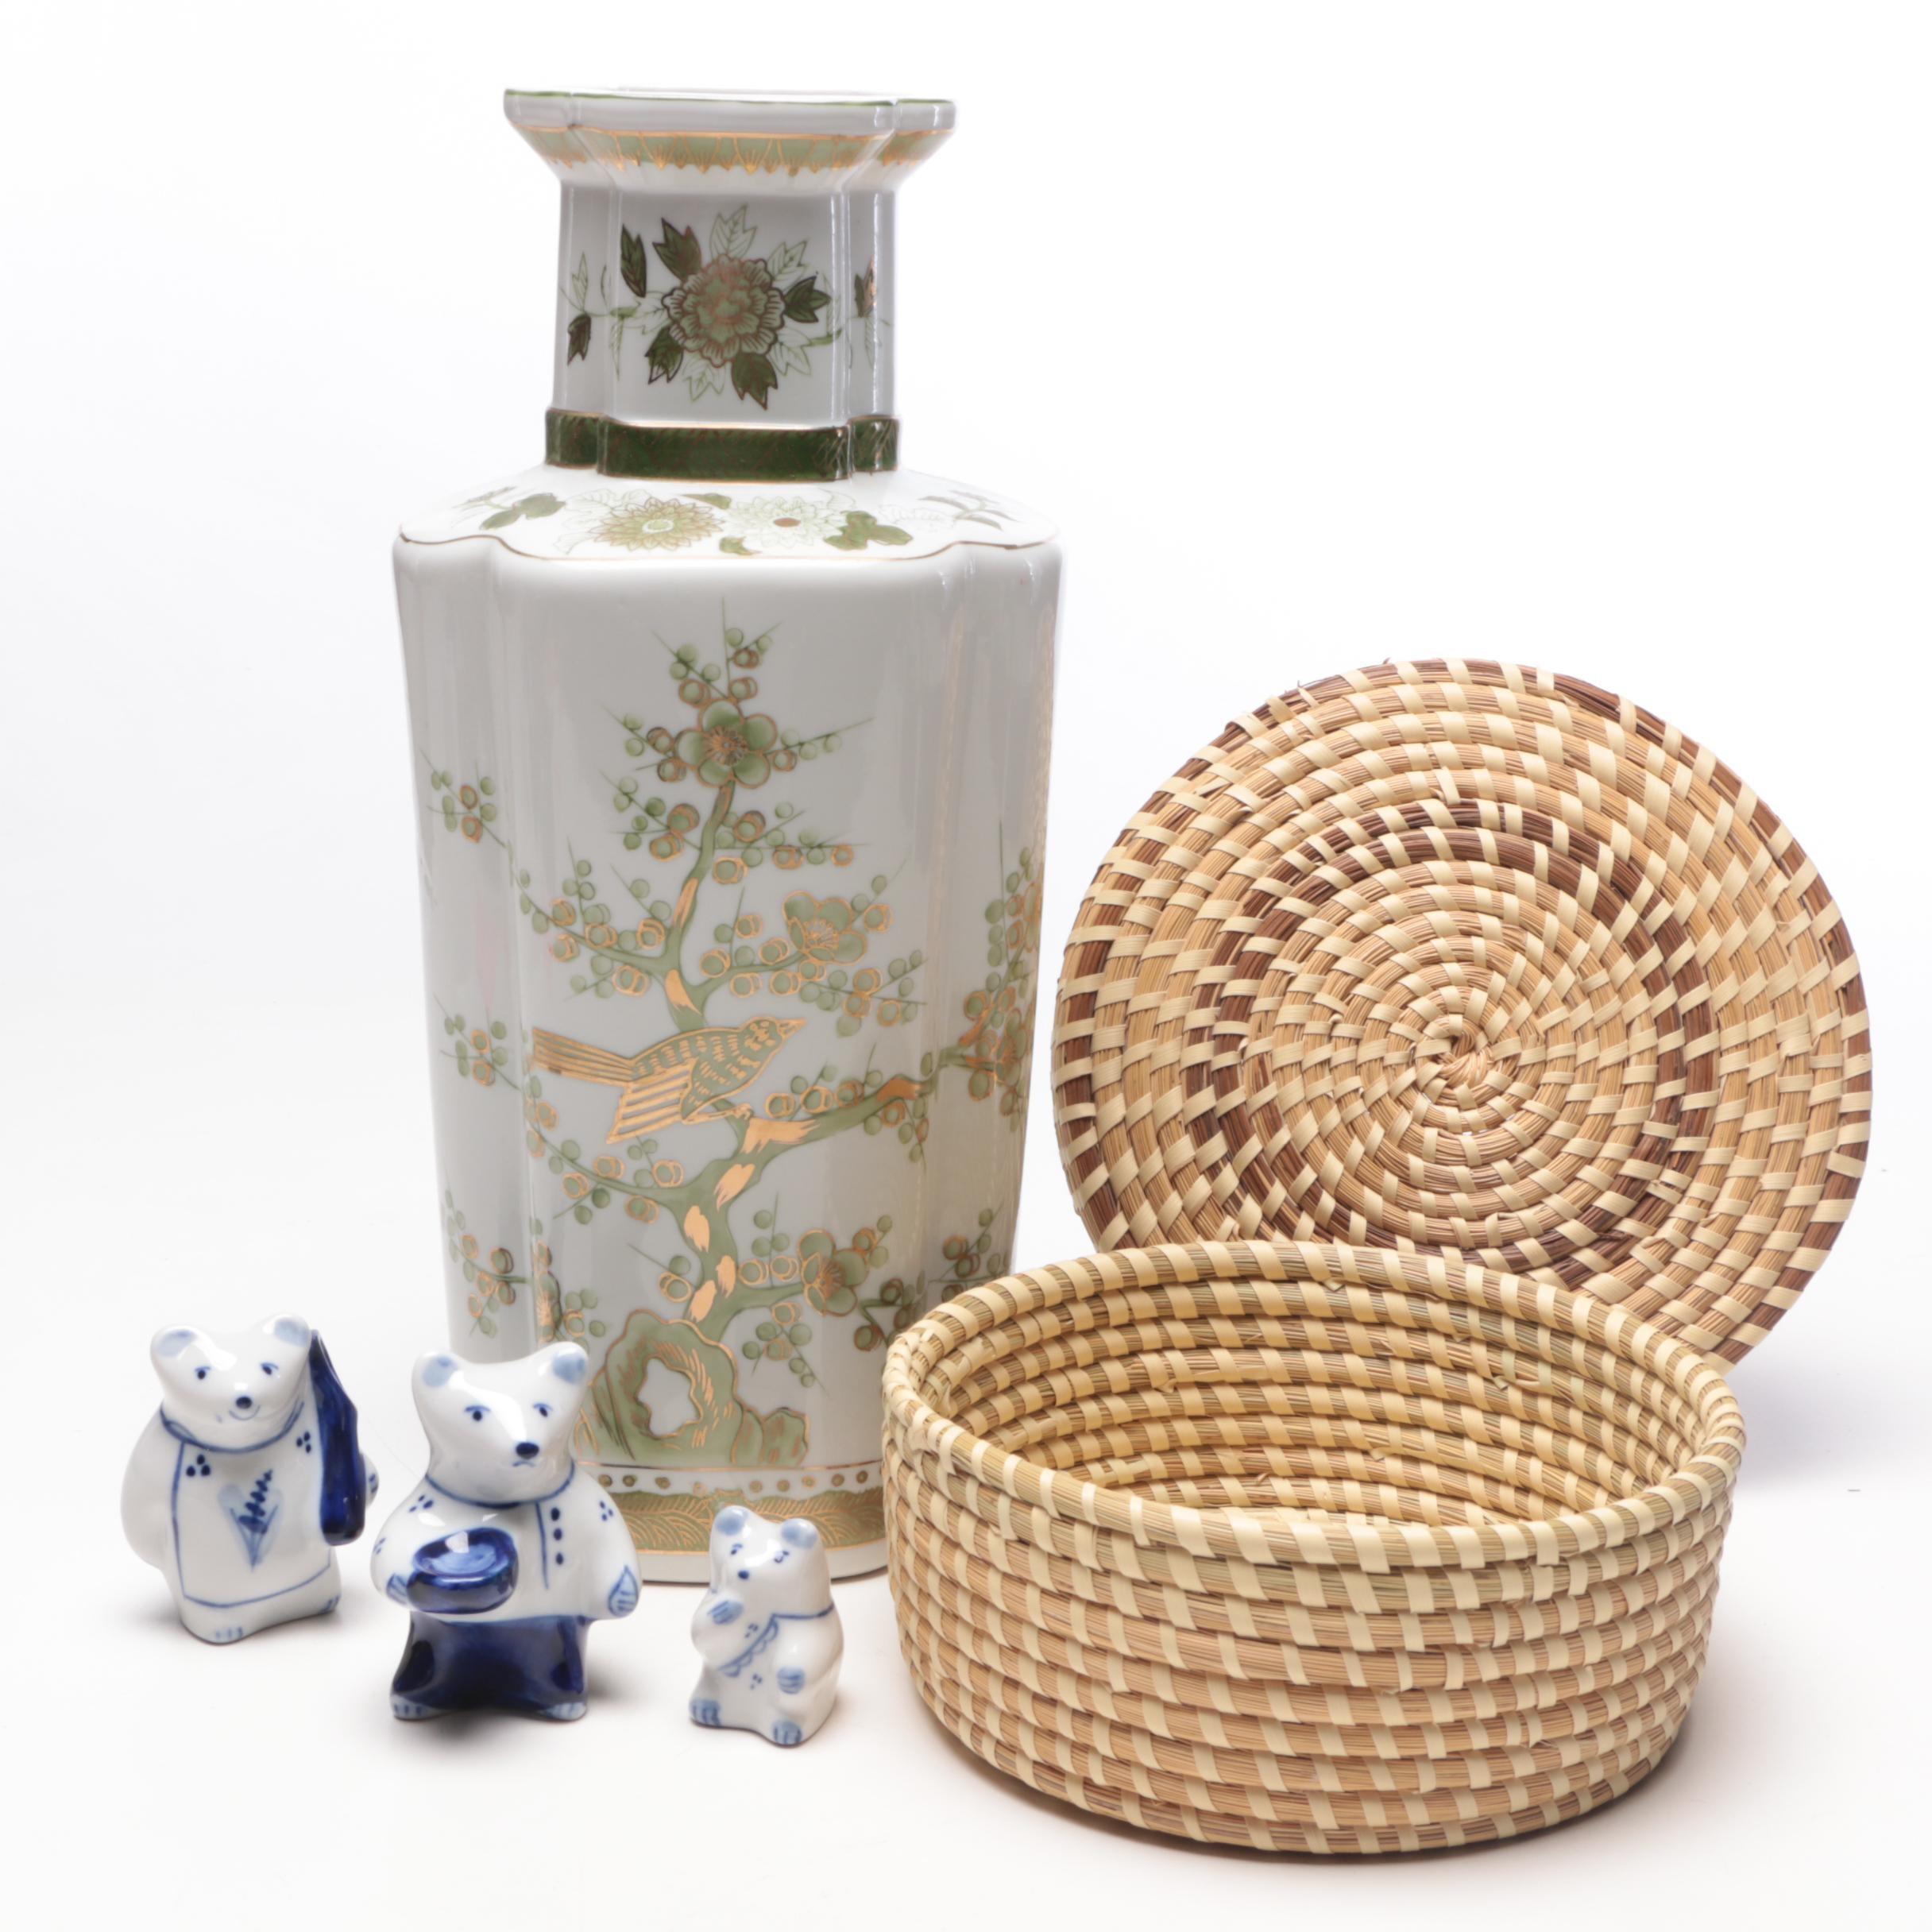 Andrea by Sadek Porcelain Vase, Handwoven Basket and Porcelain Bears, Circa 1970